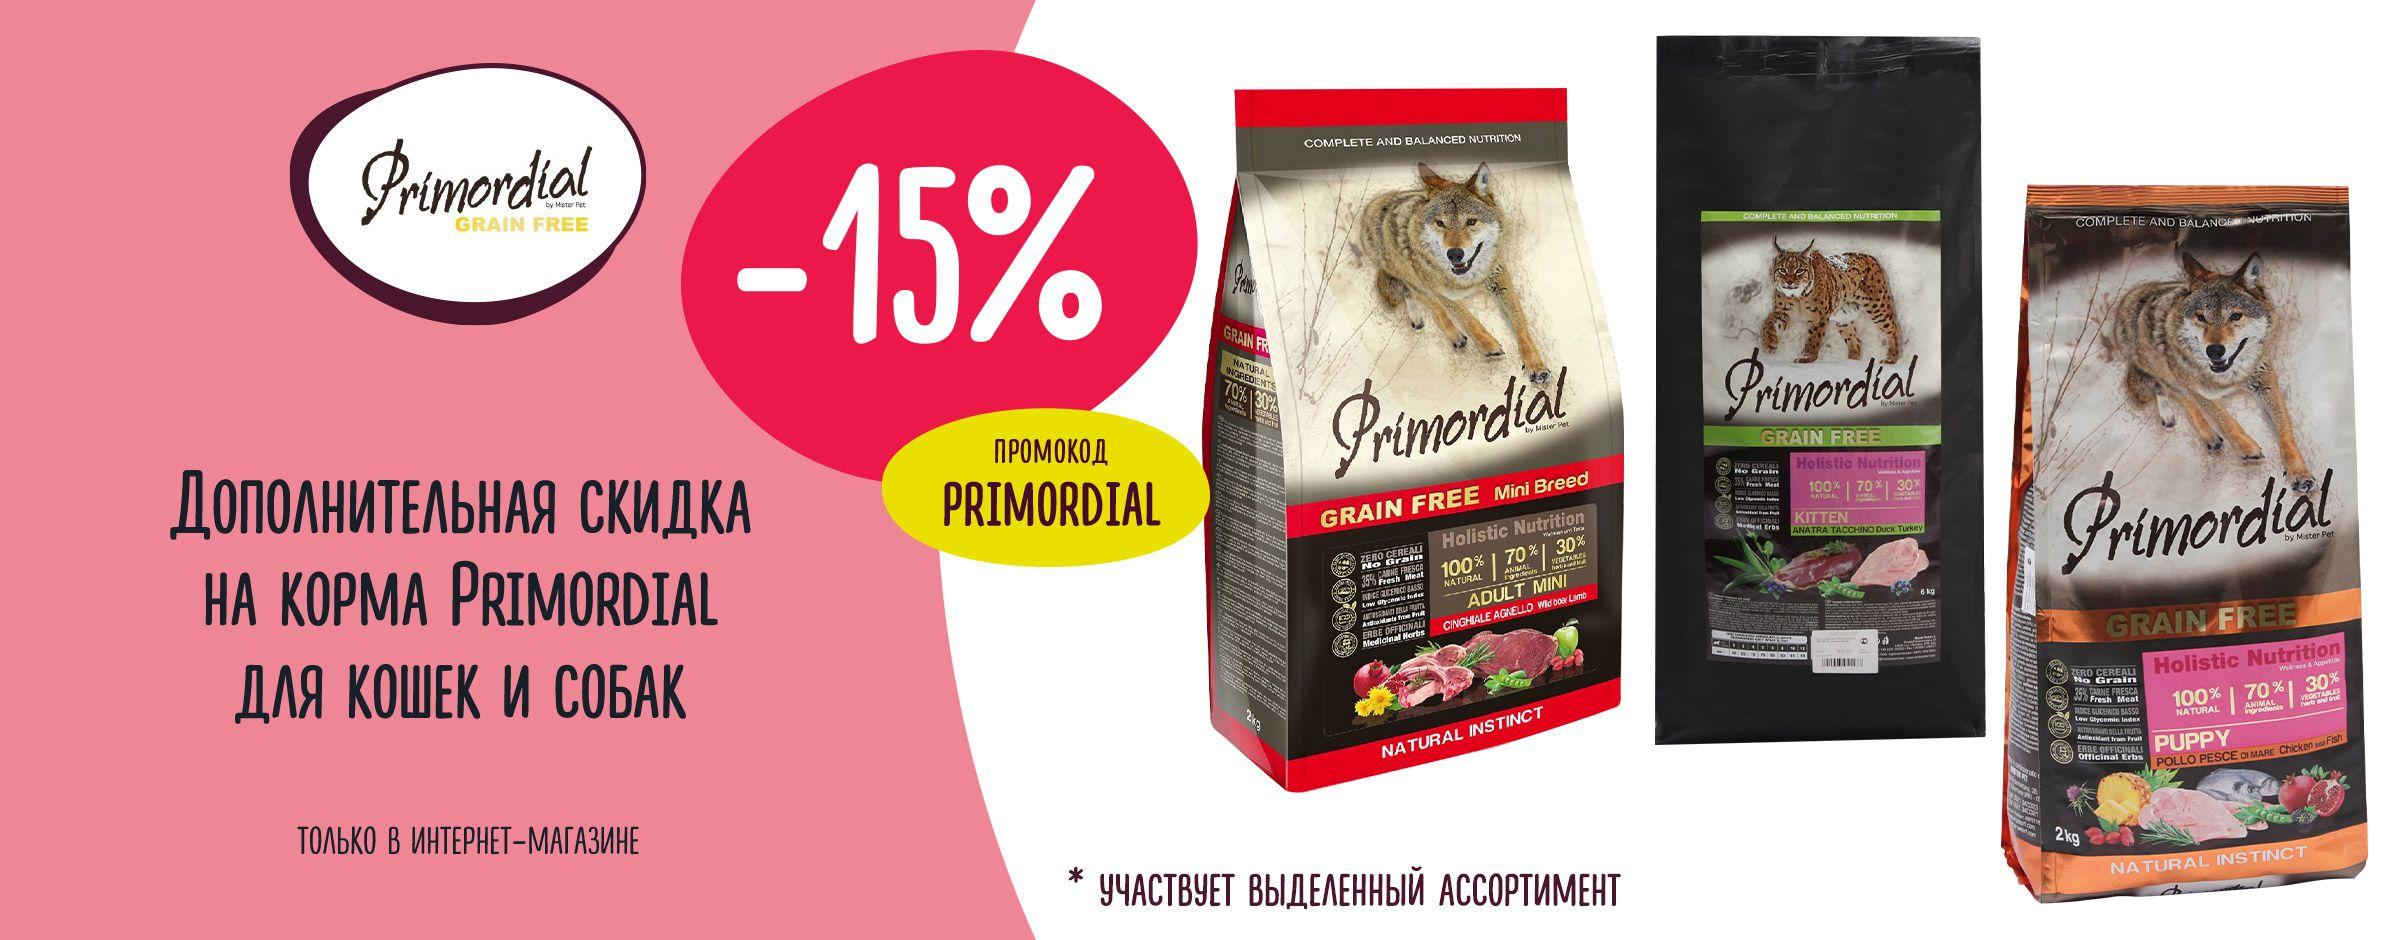 15% на корма Primordial  по промокоду PRIMORDIA выходные